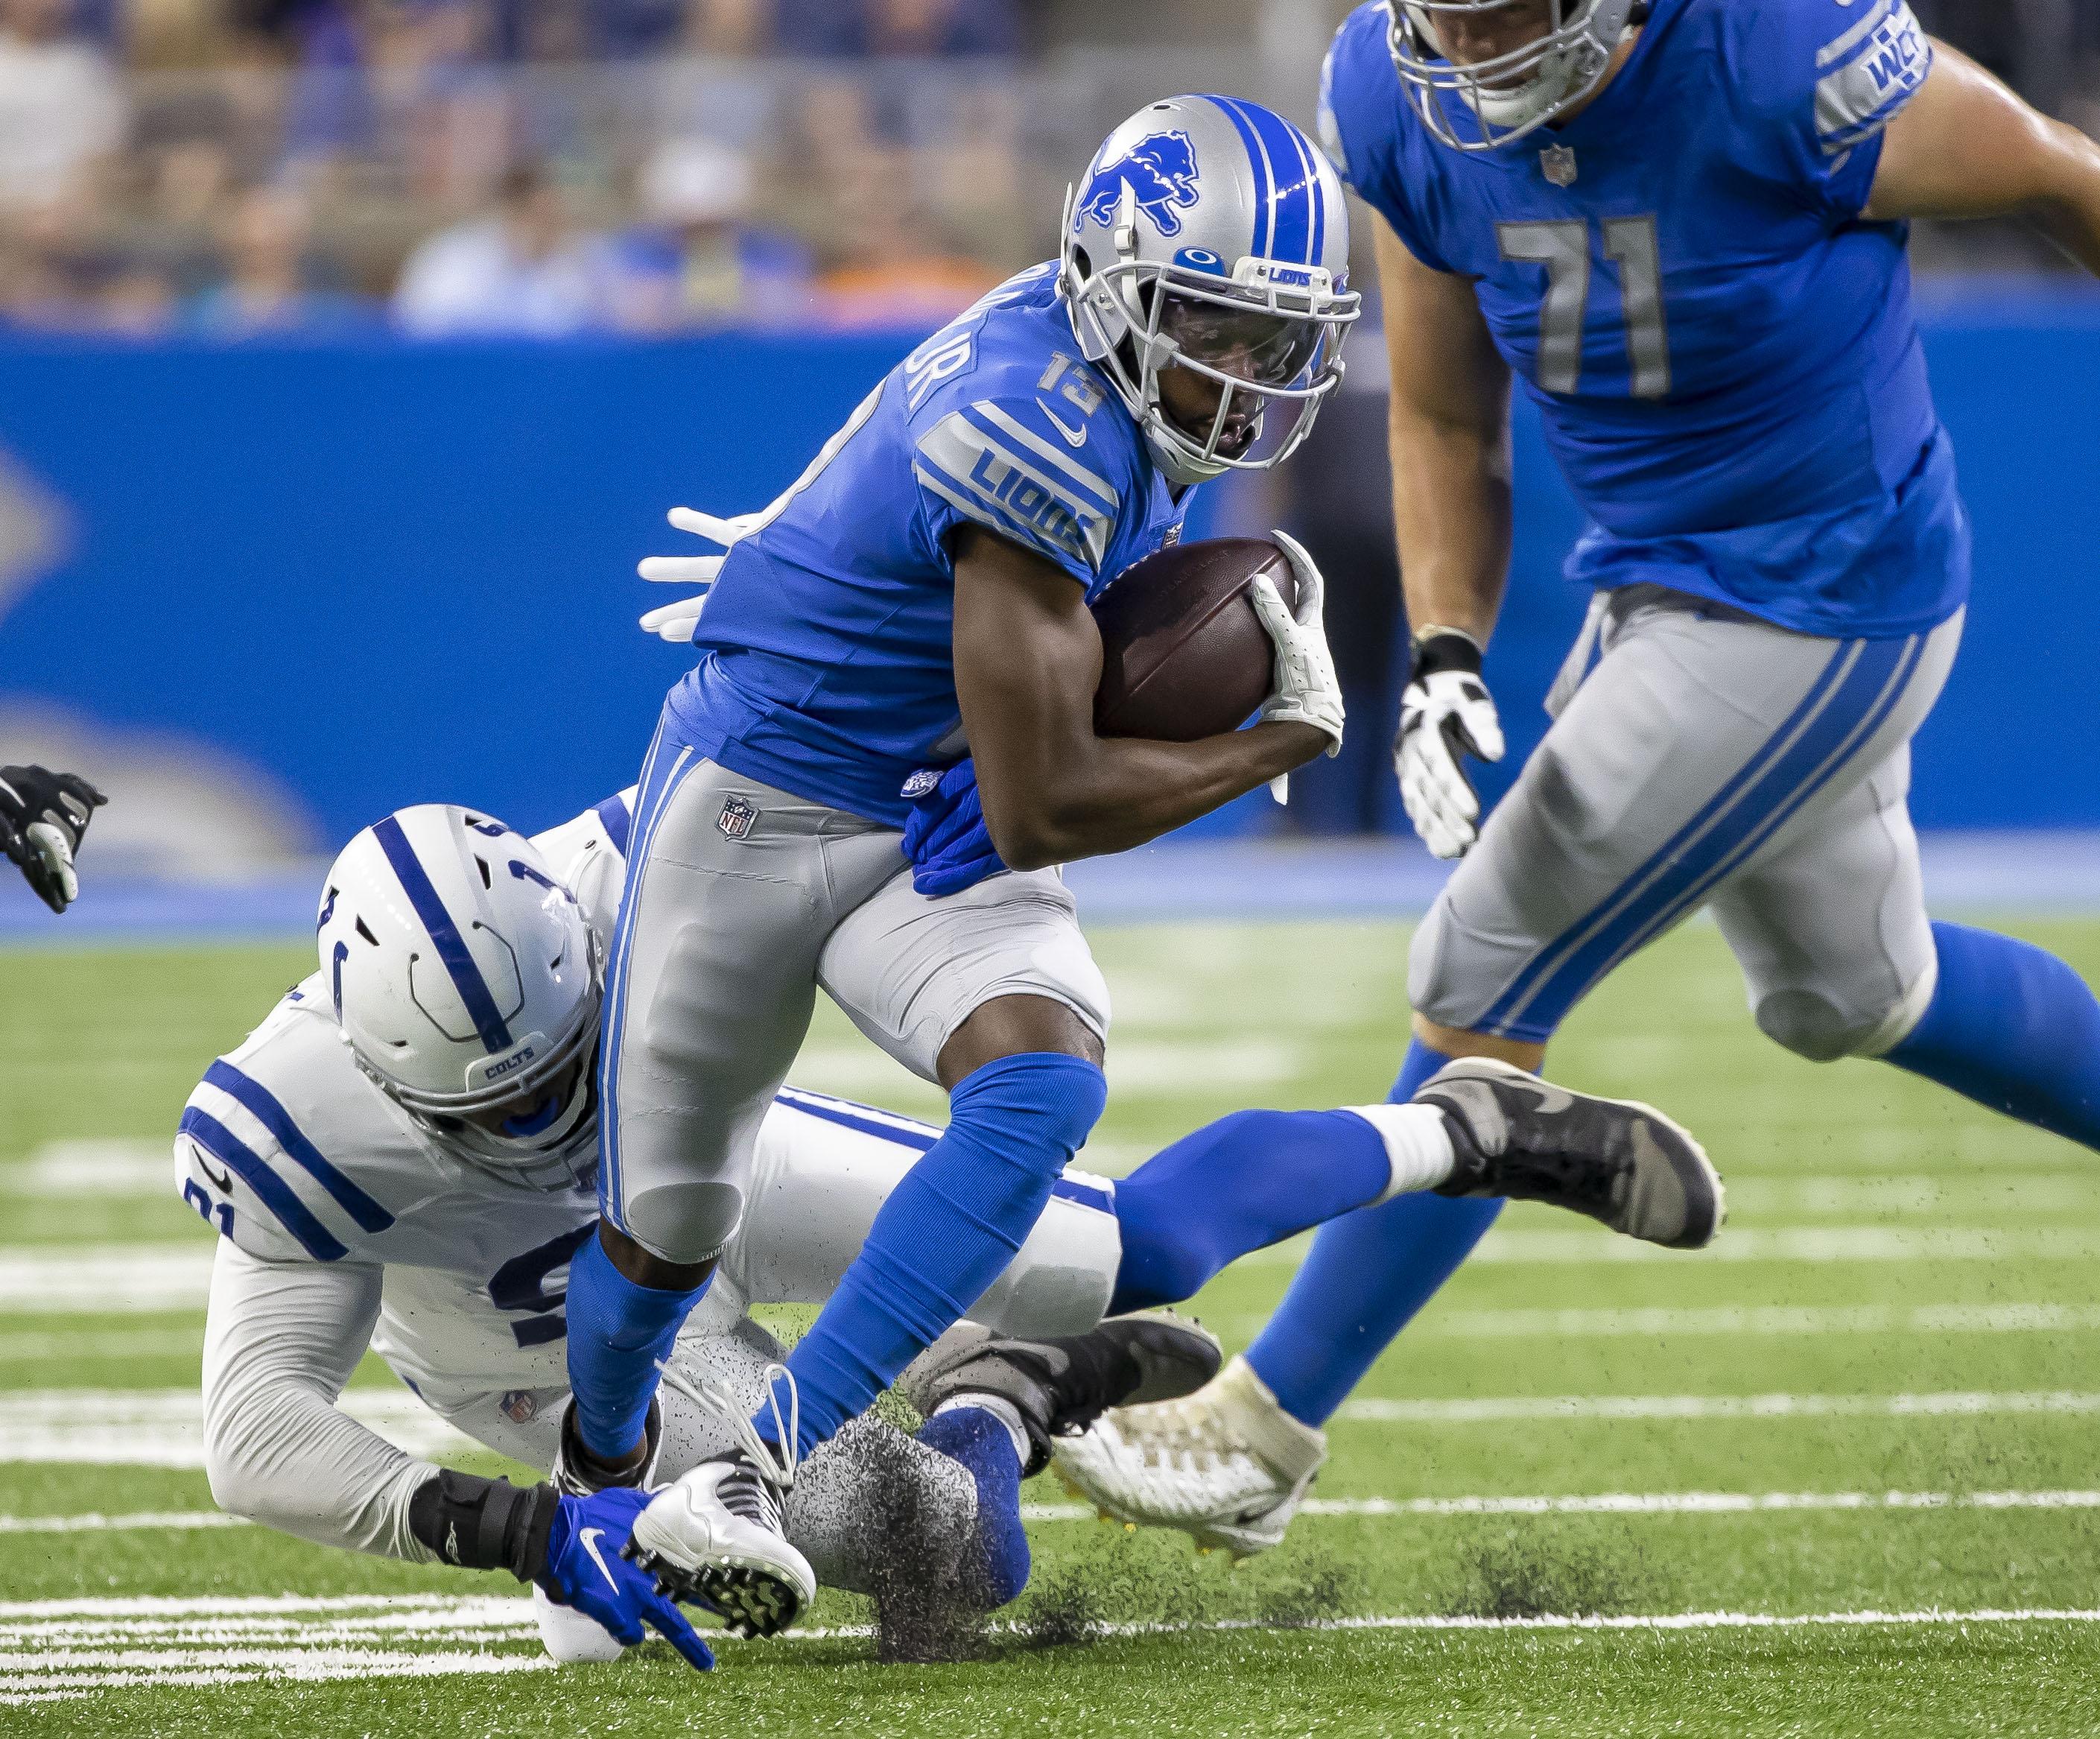 NFL: Indianapolis Colts at Detroit Lions